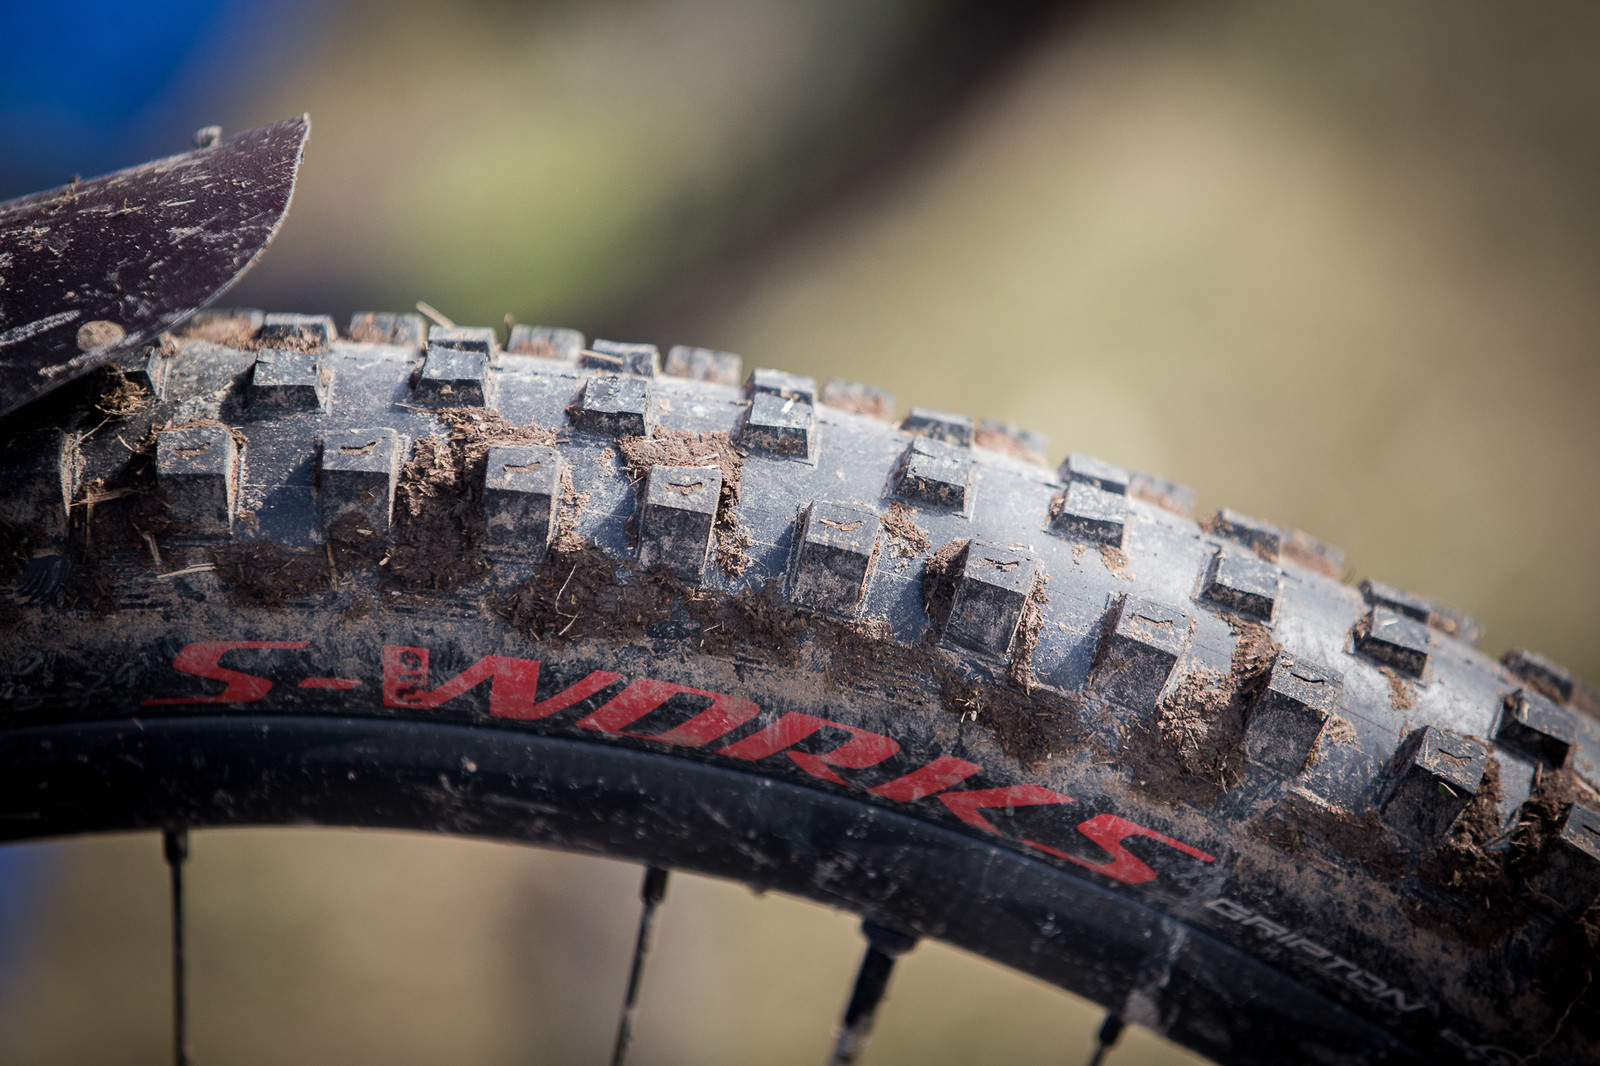 Prototype 29er Specialized Hillbilly Tires - PIT BITS - Enduro World Series, Valberg - Mountain Biking Pictures - Vital MTB